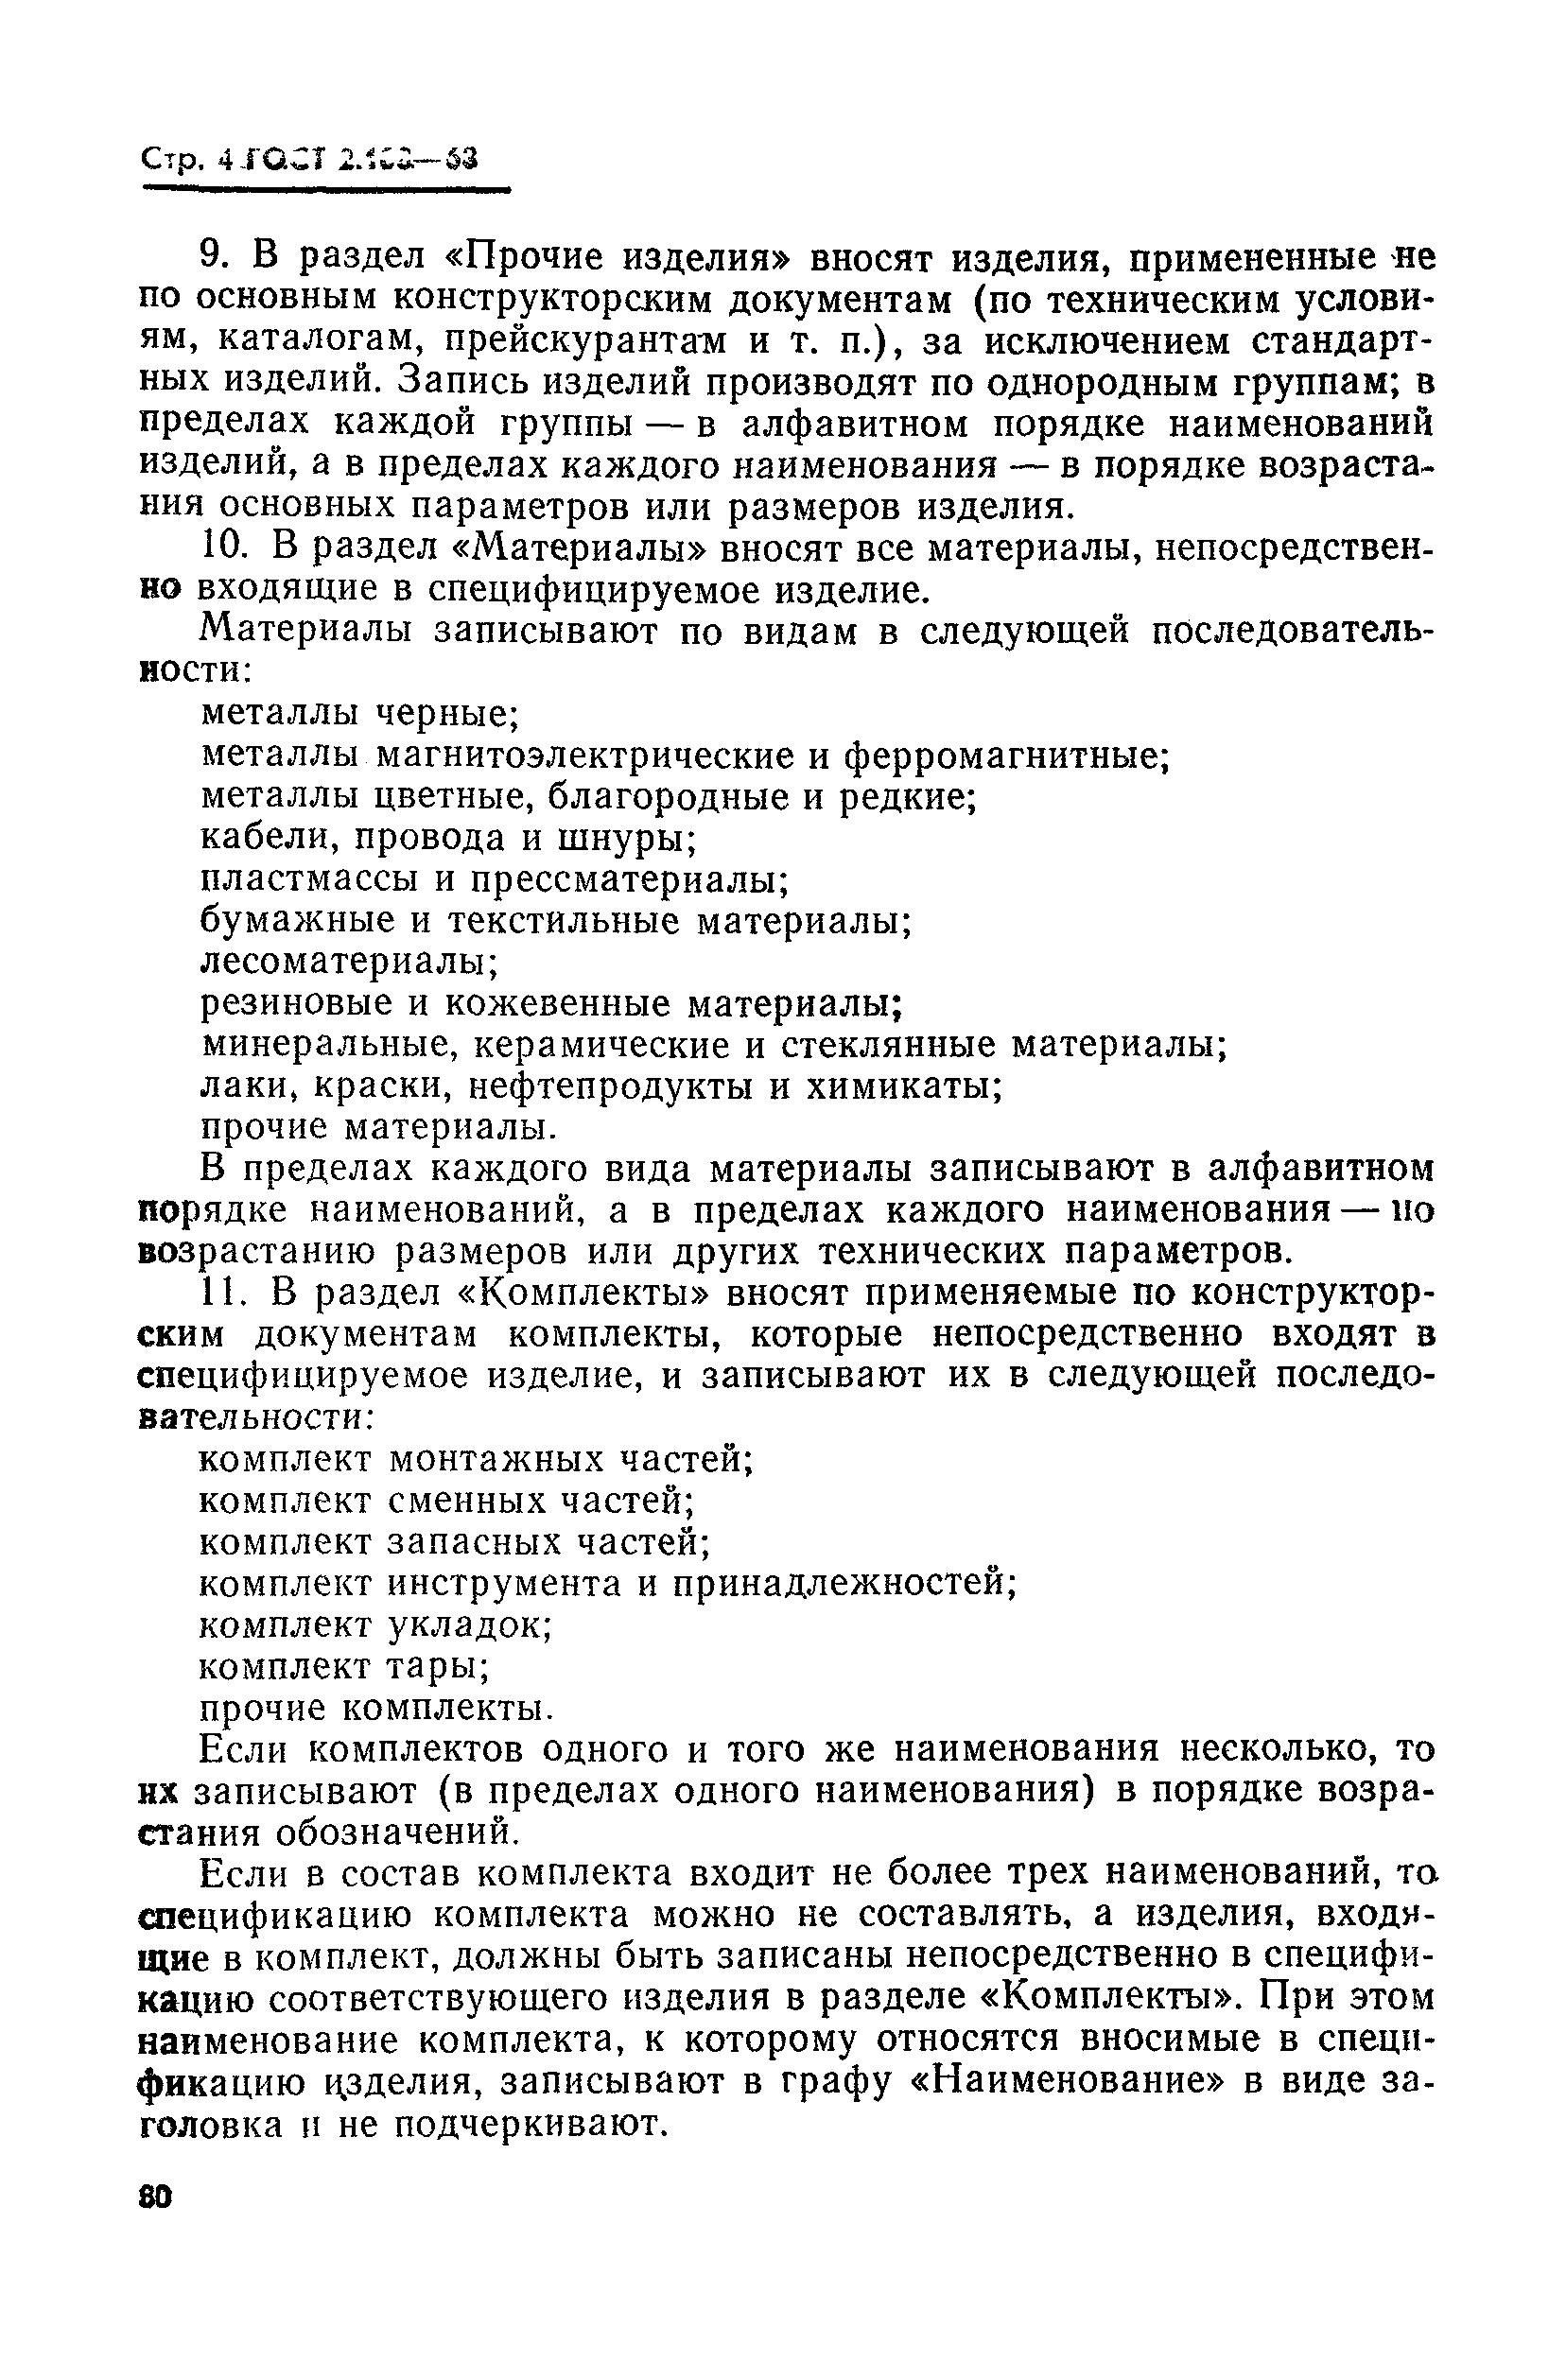 гост 2.108-68 бланк спецификации